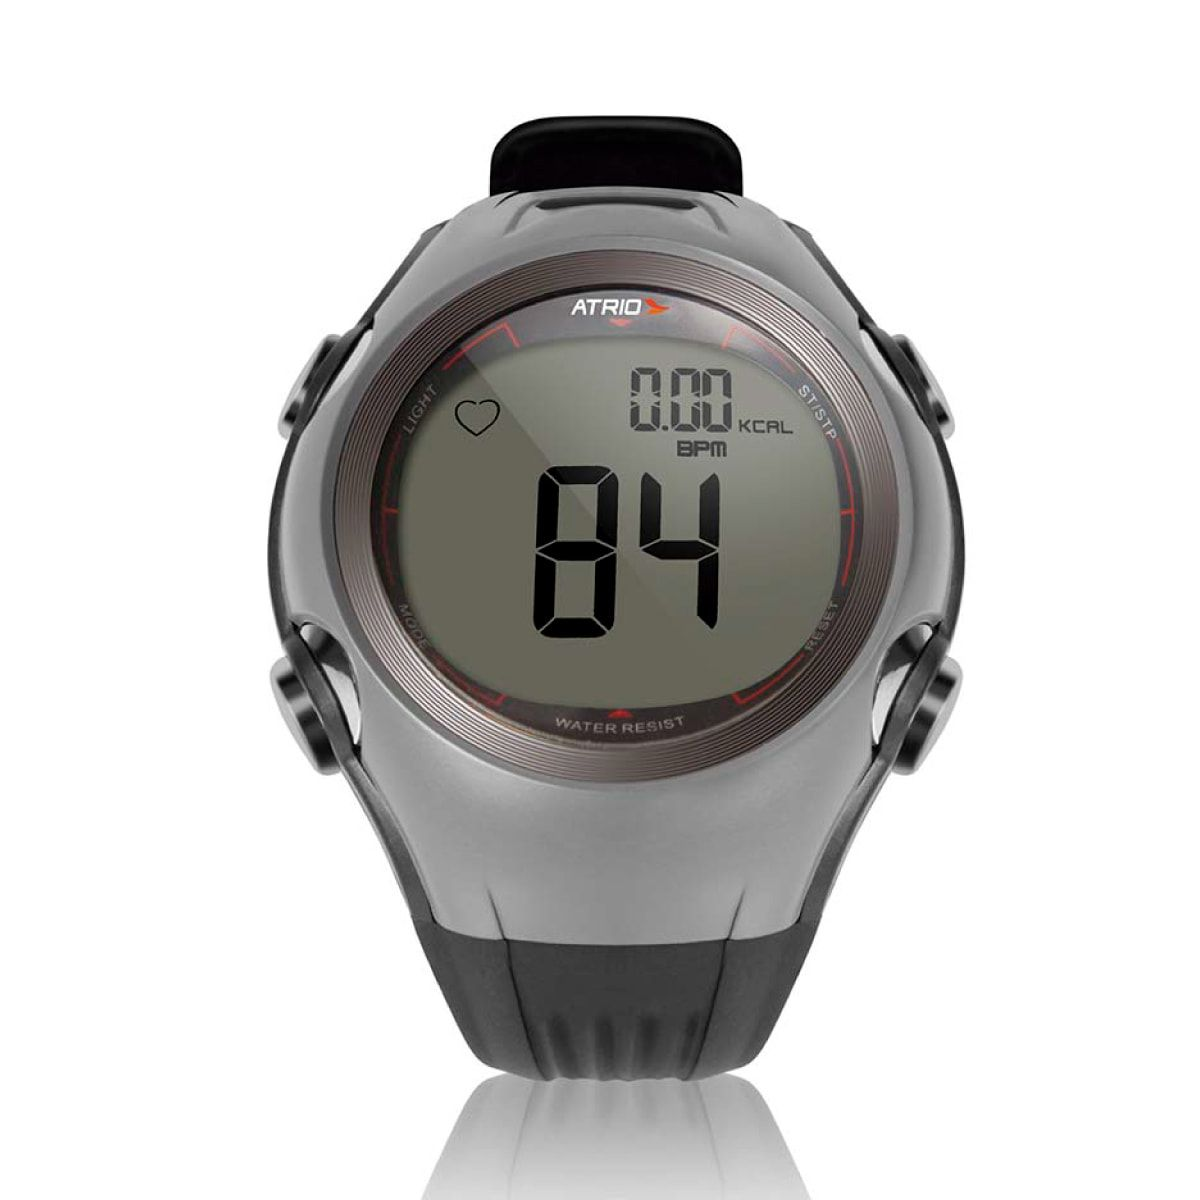 Monitor Cardíaco Atrio Altius Resistente A Água + Cinta Cardíaca